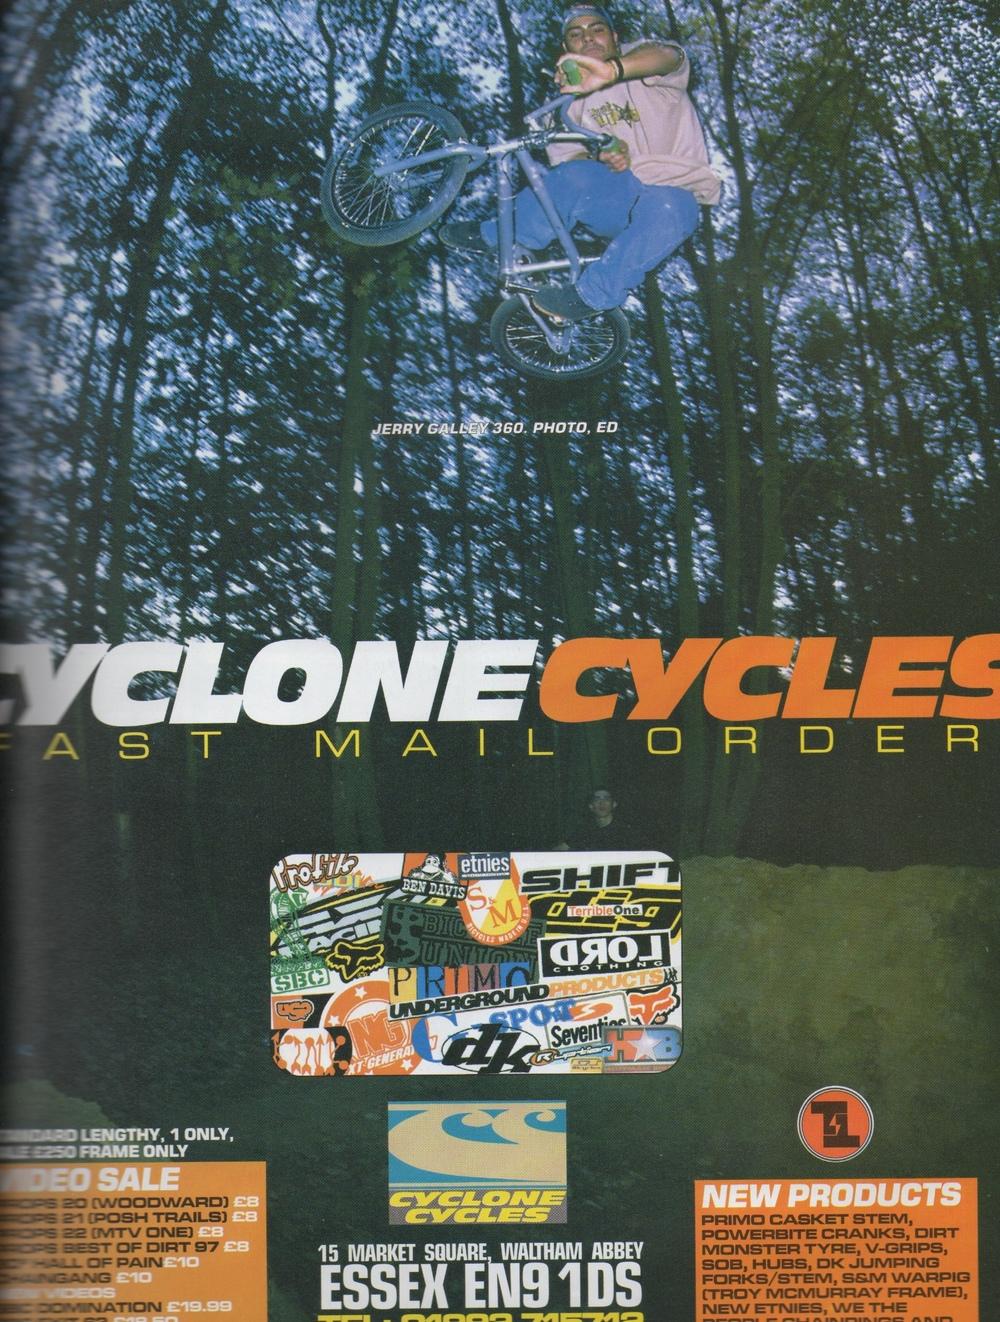 jerrycyclone.jpg